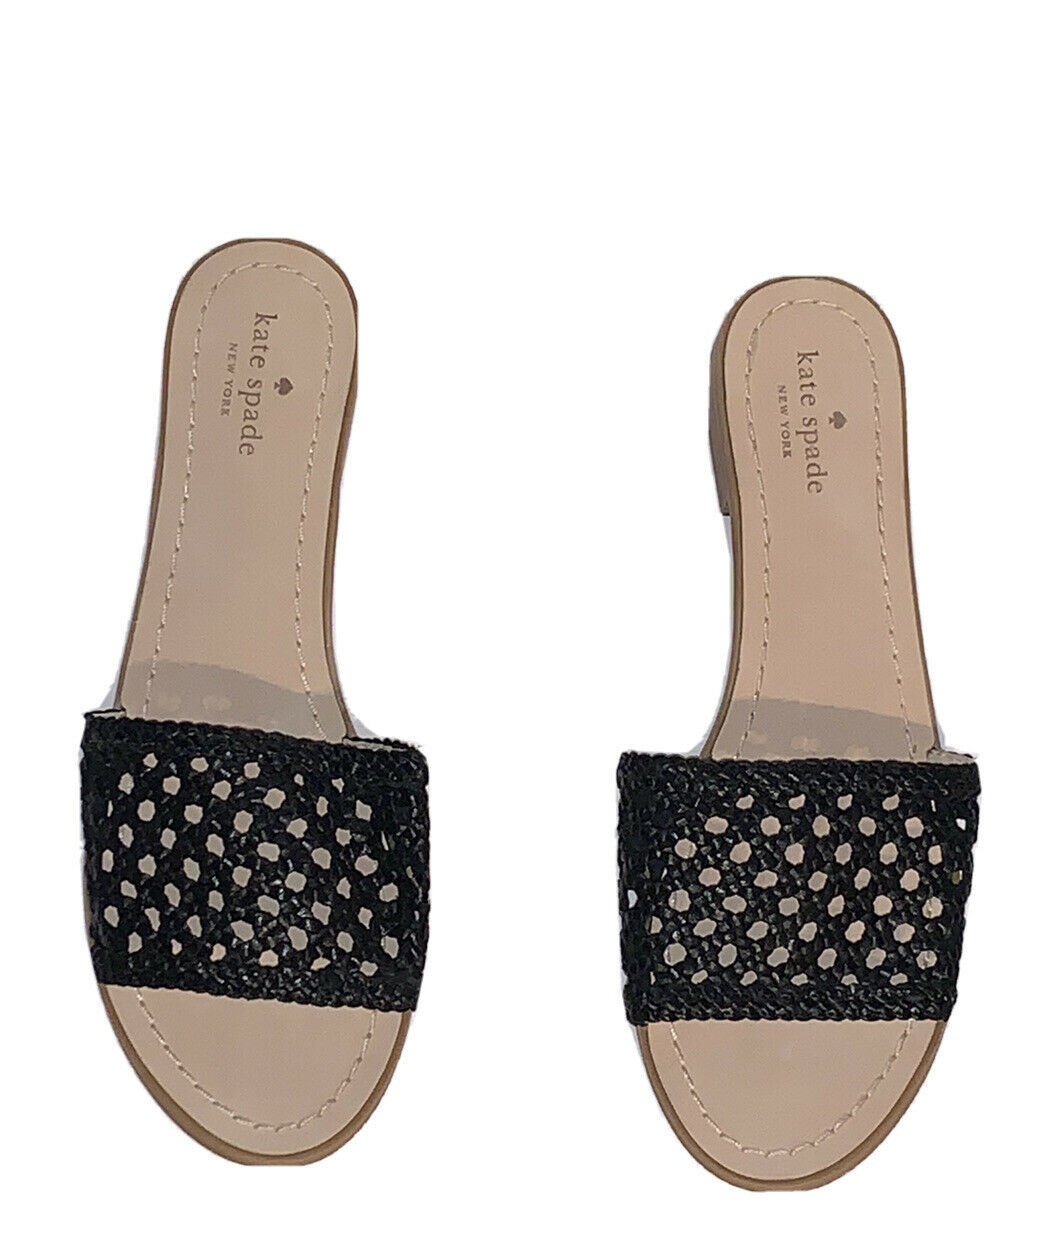 NEW $129 Kate Spade New York Berlin Black Woven Leather Slides/Sandals 11 - $65.00